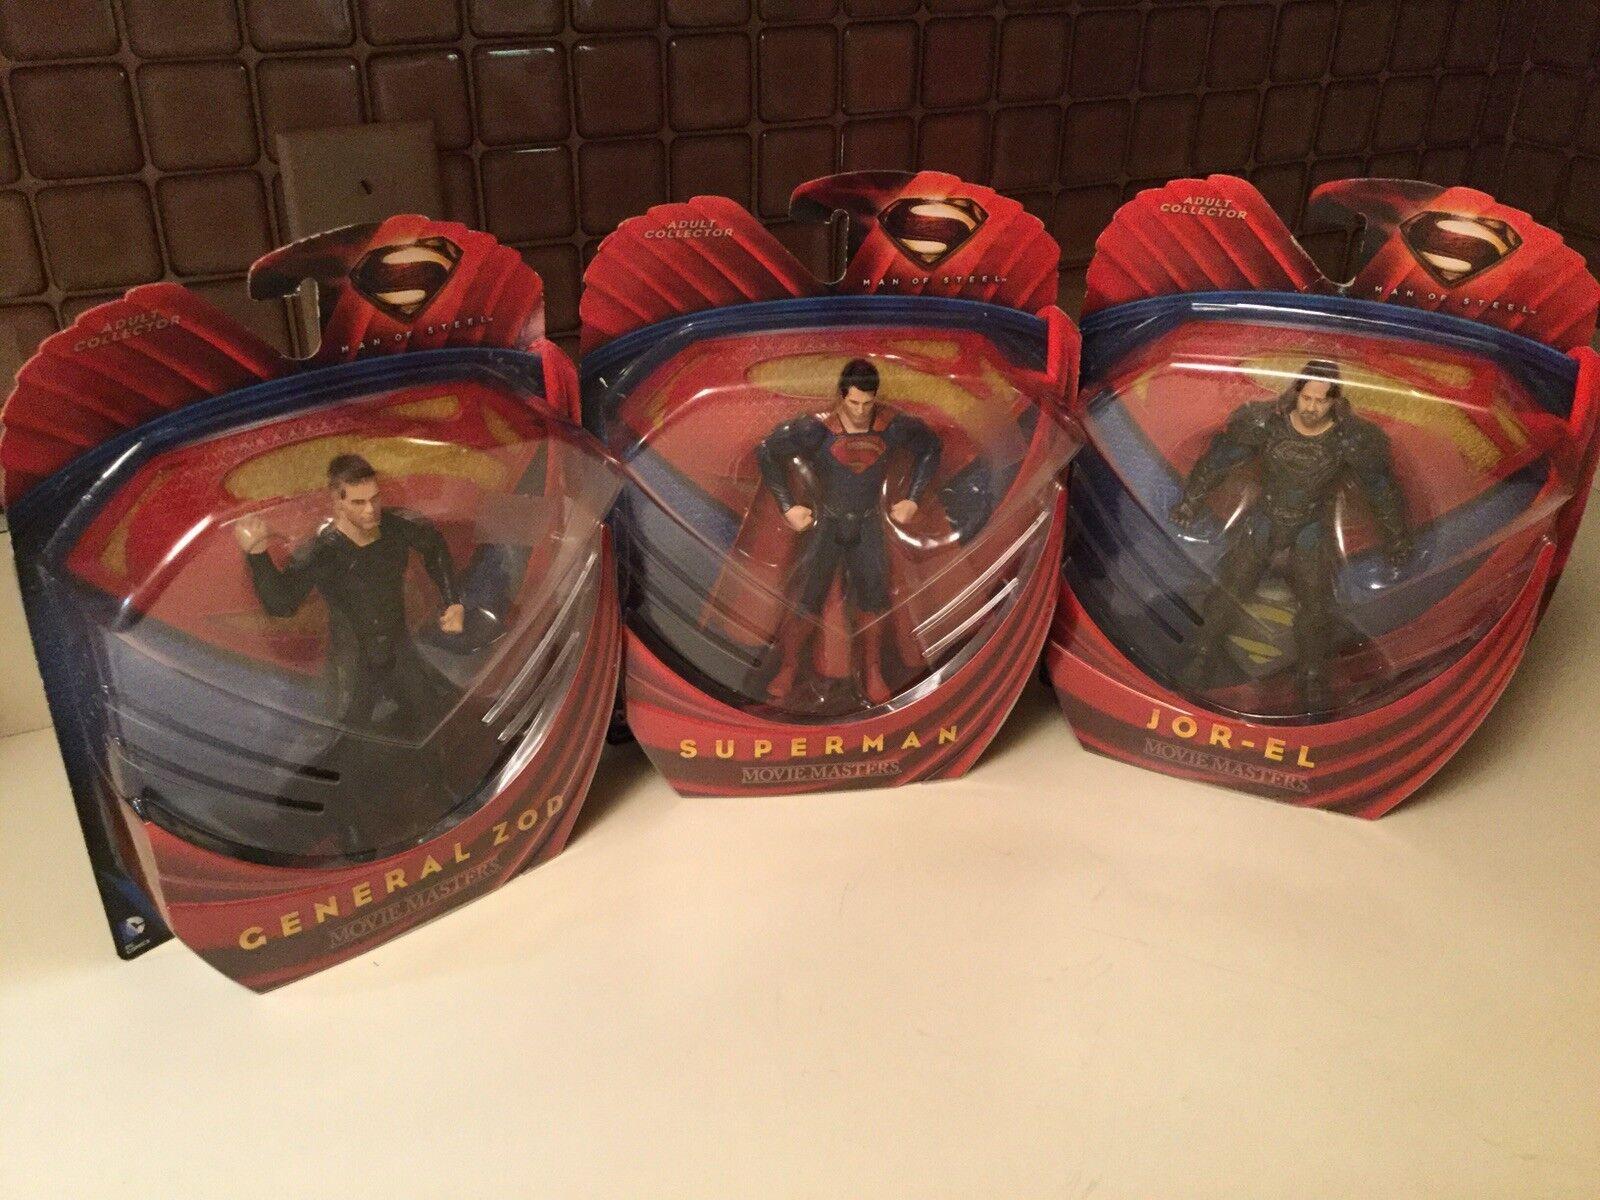 Superman - general zod  jor - el - film - mann stahl actionfiguren, reihe 3 mip